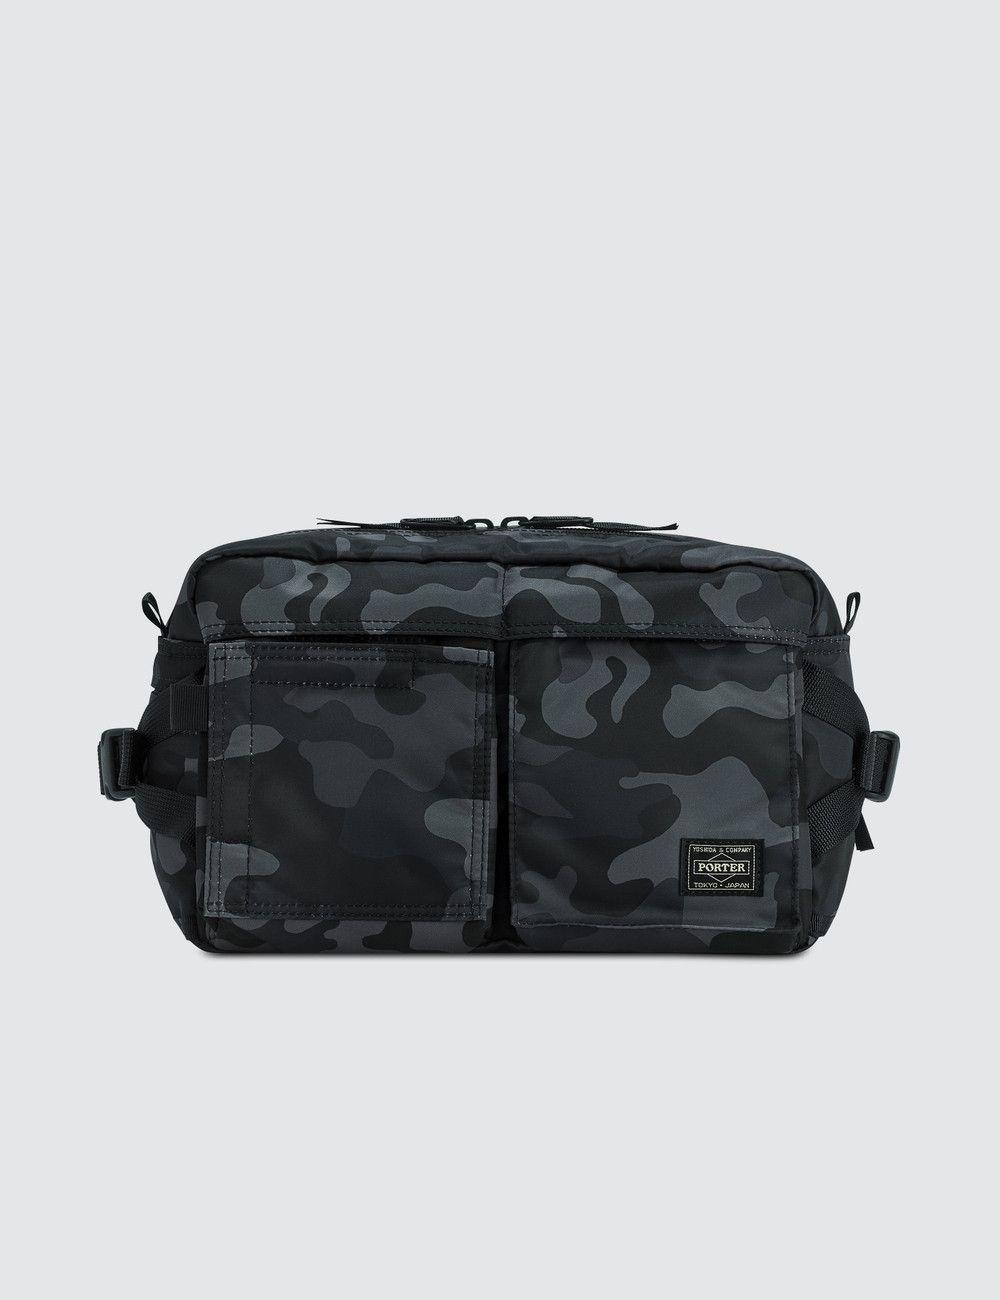 ddb85e6586 Head Porter Jungle New Waist Bag